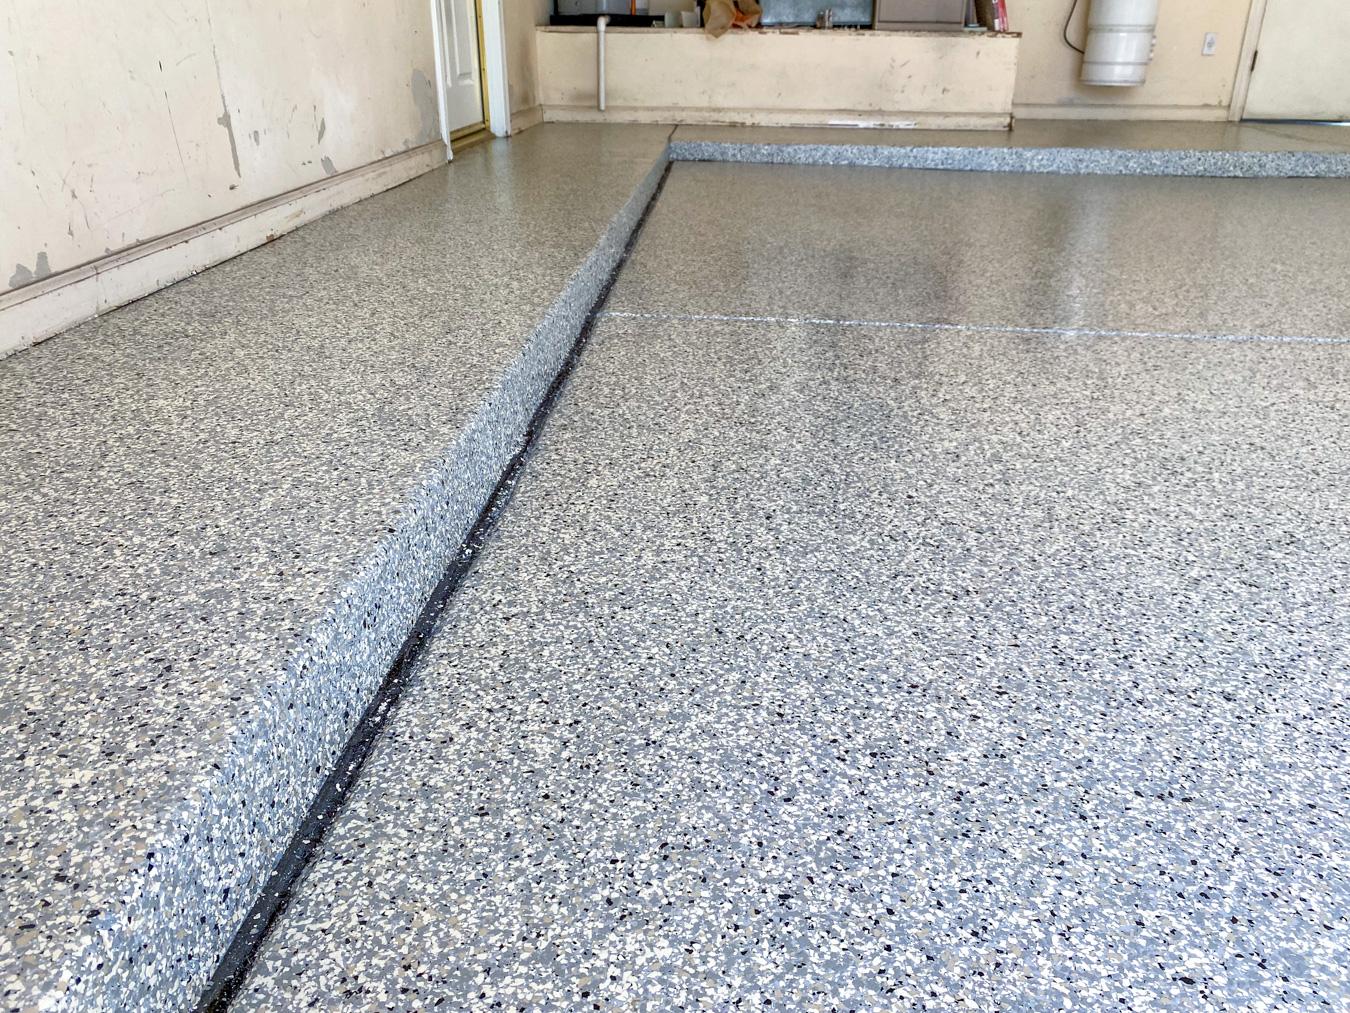 Gray Epoxy Concrete Coating on a Garage Floor